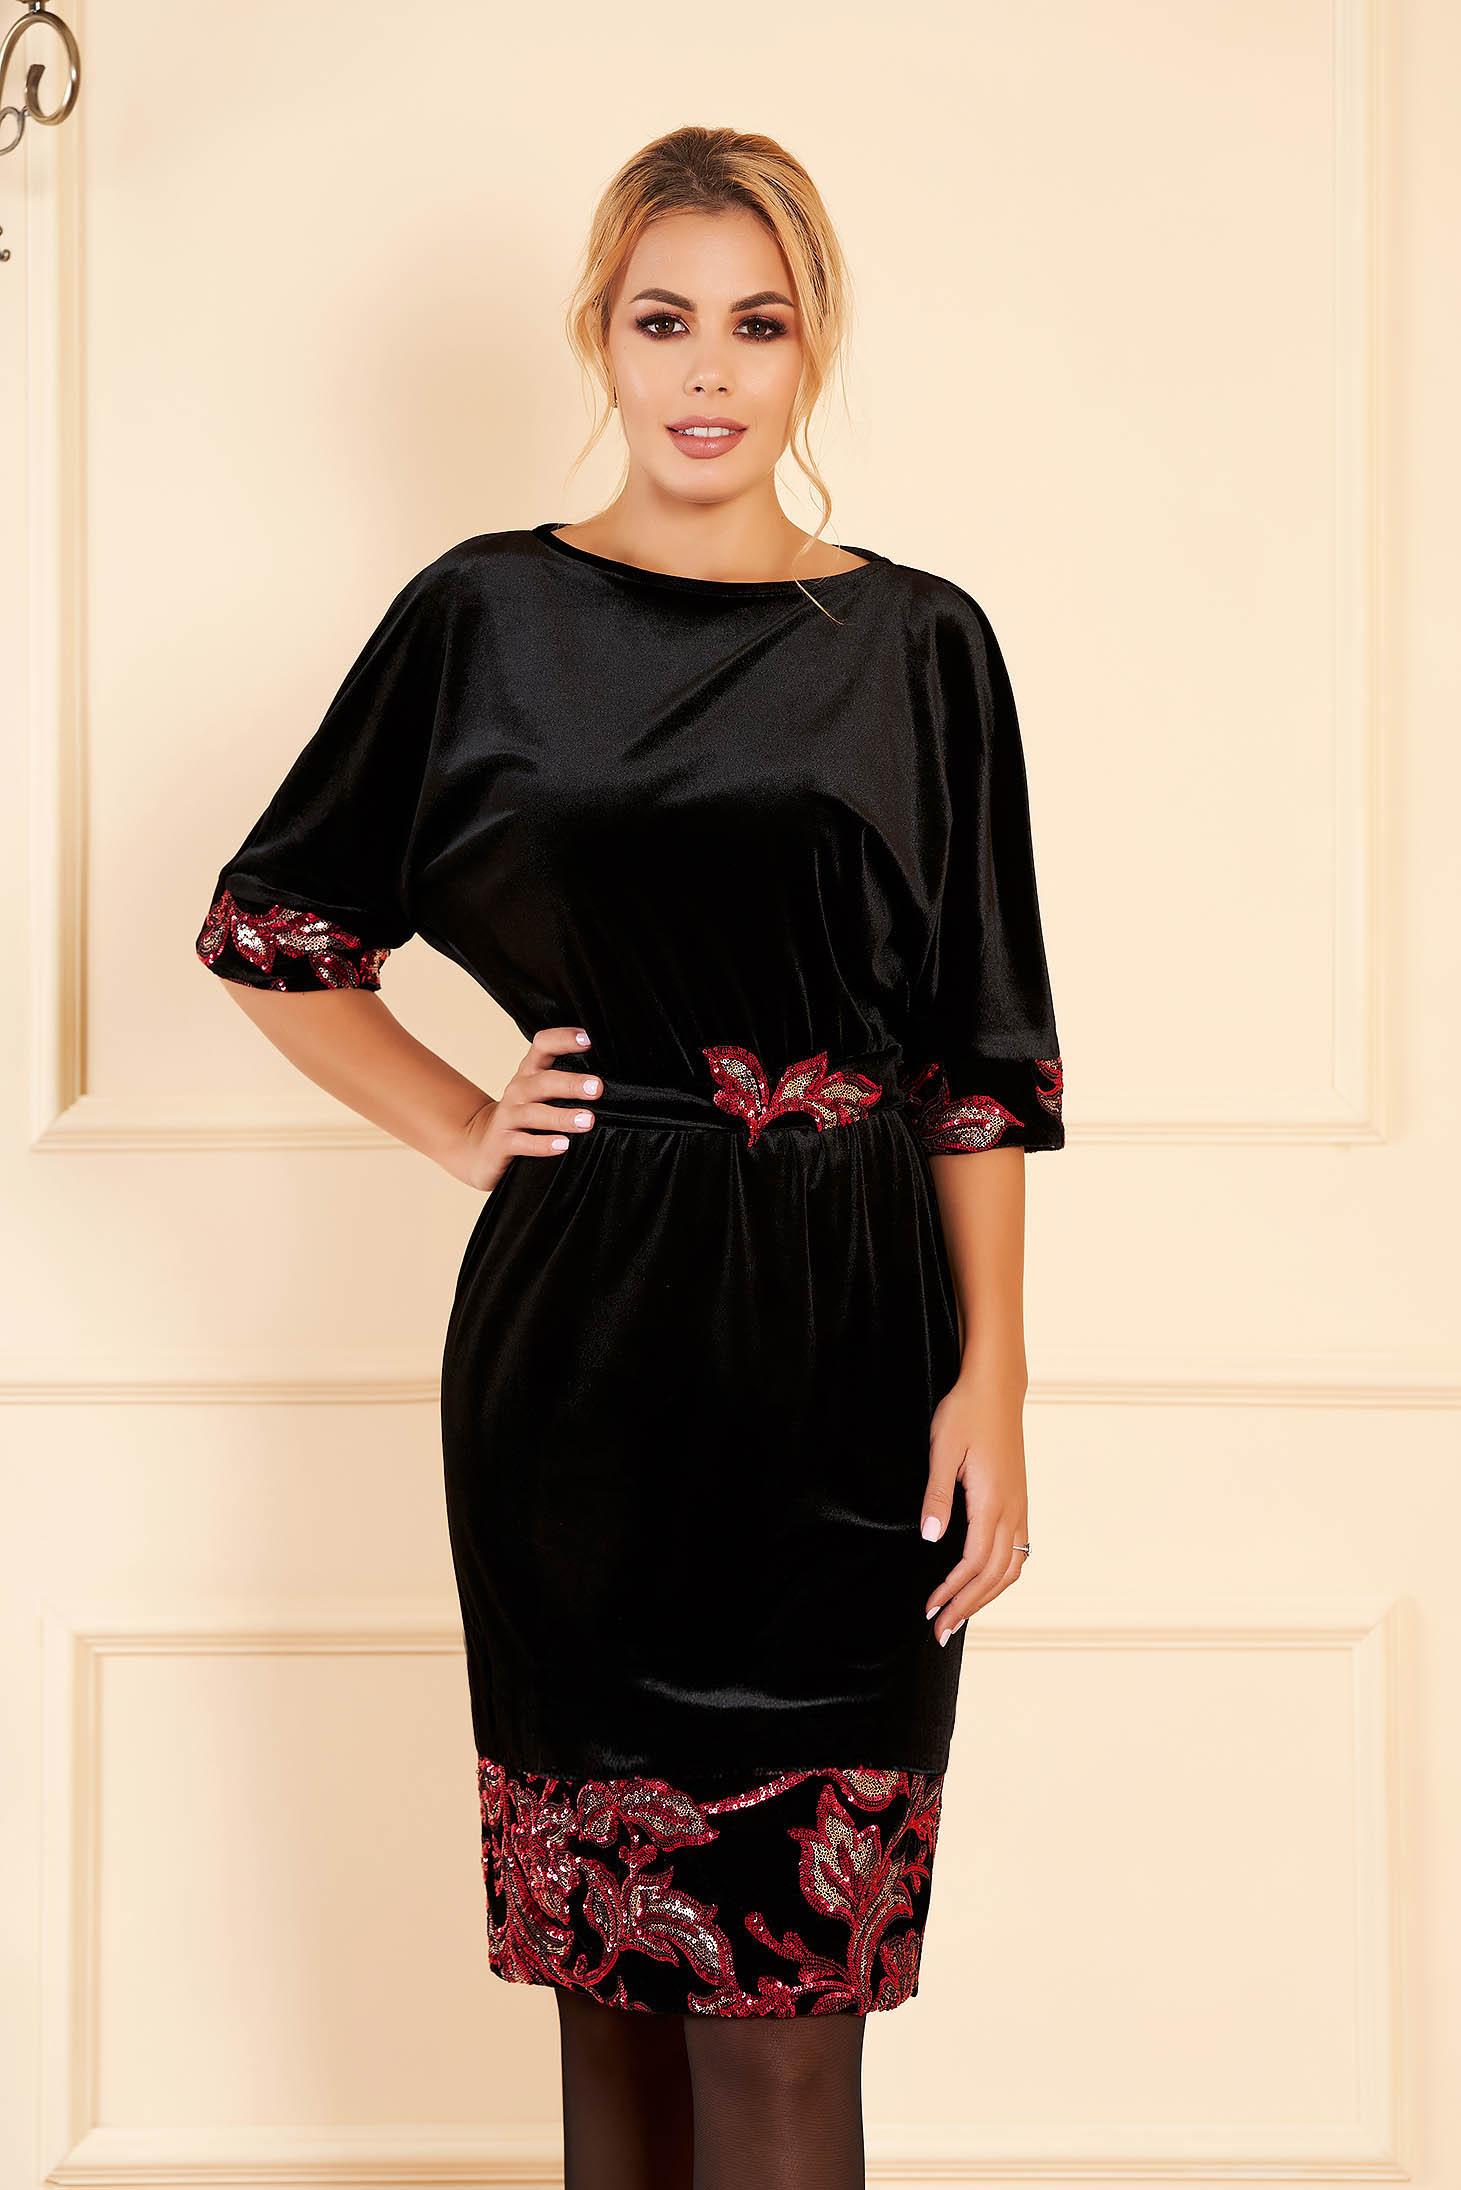 Rochie StarShinerS neagra cu detalii rosii de ocazie cu un croi drept din catifea cu aplicatii cu paiete cordon detasabil si maneci scurte